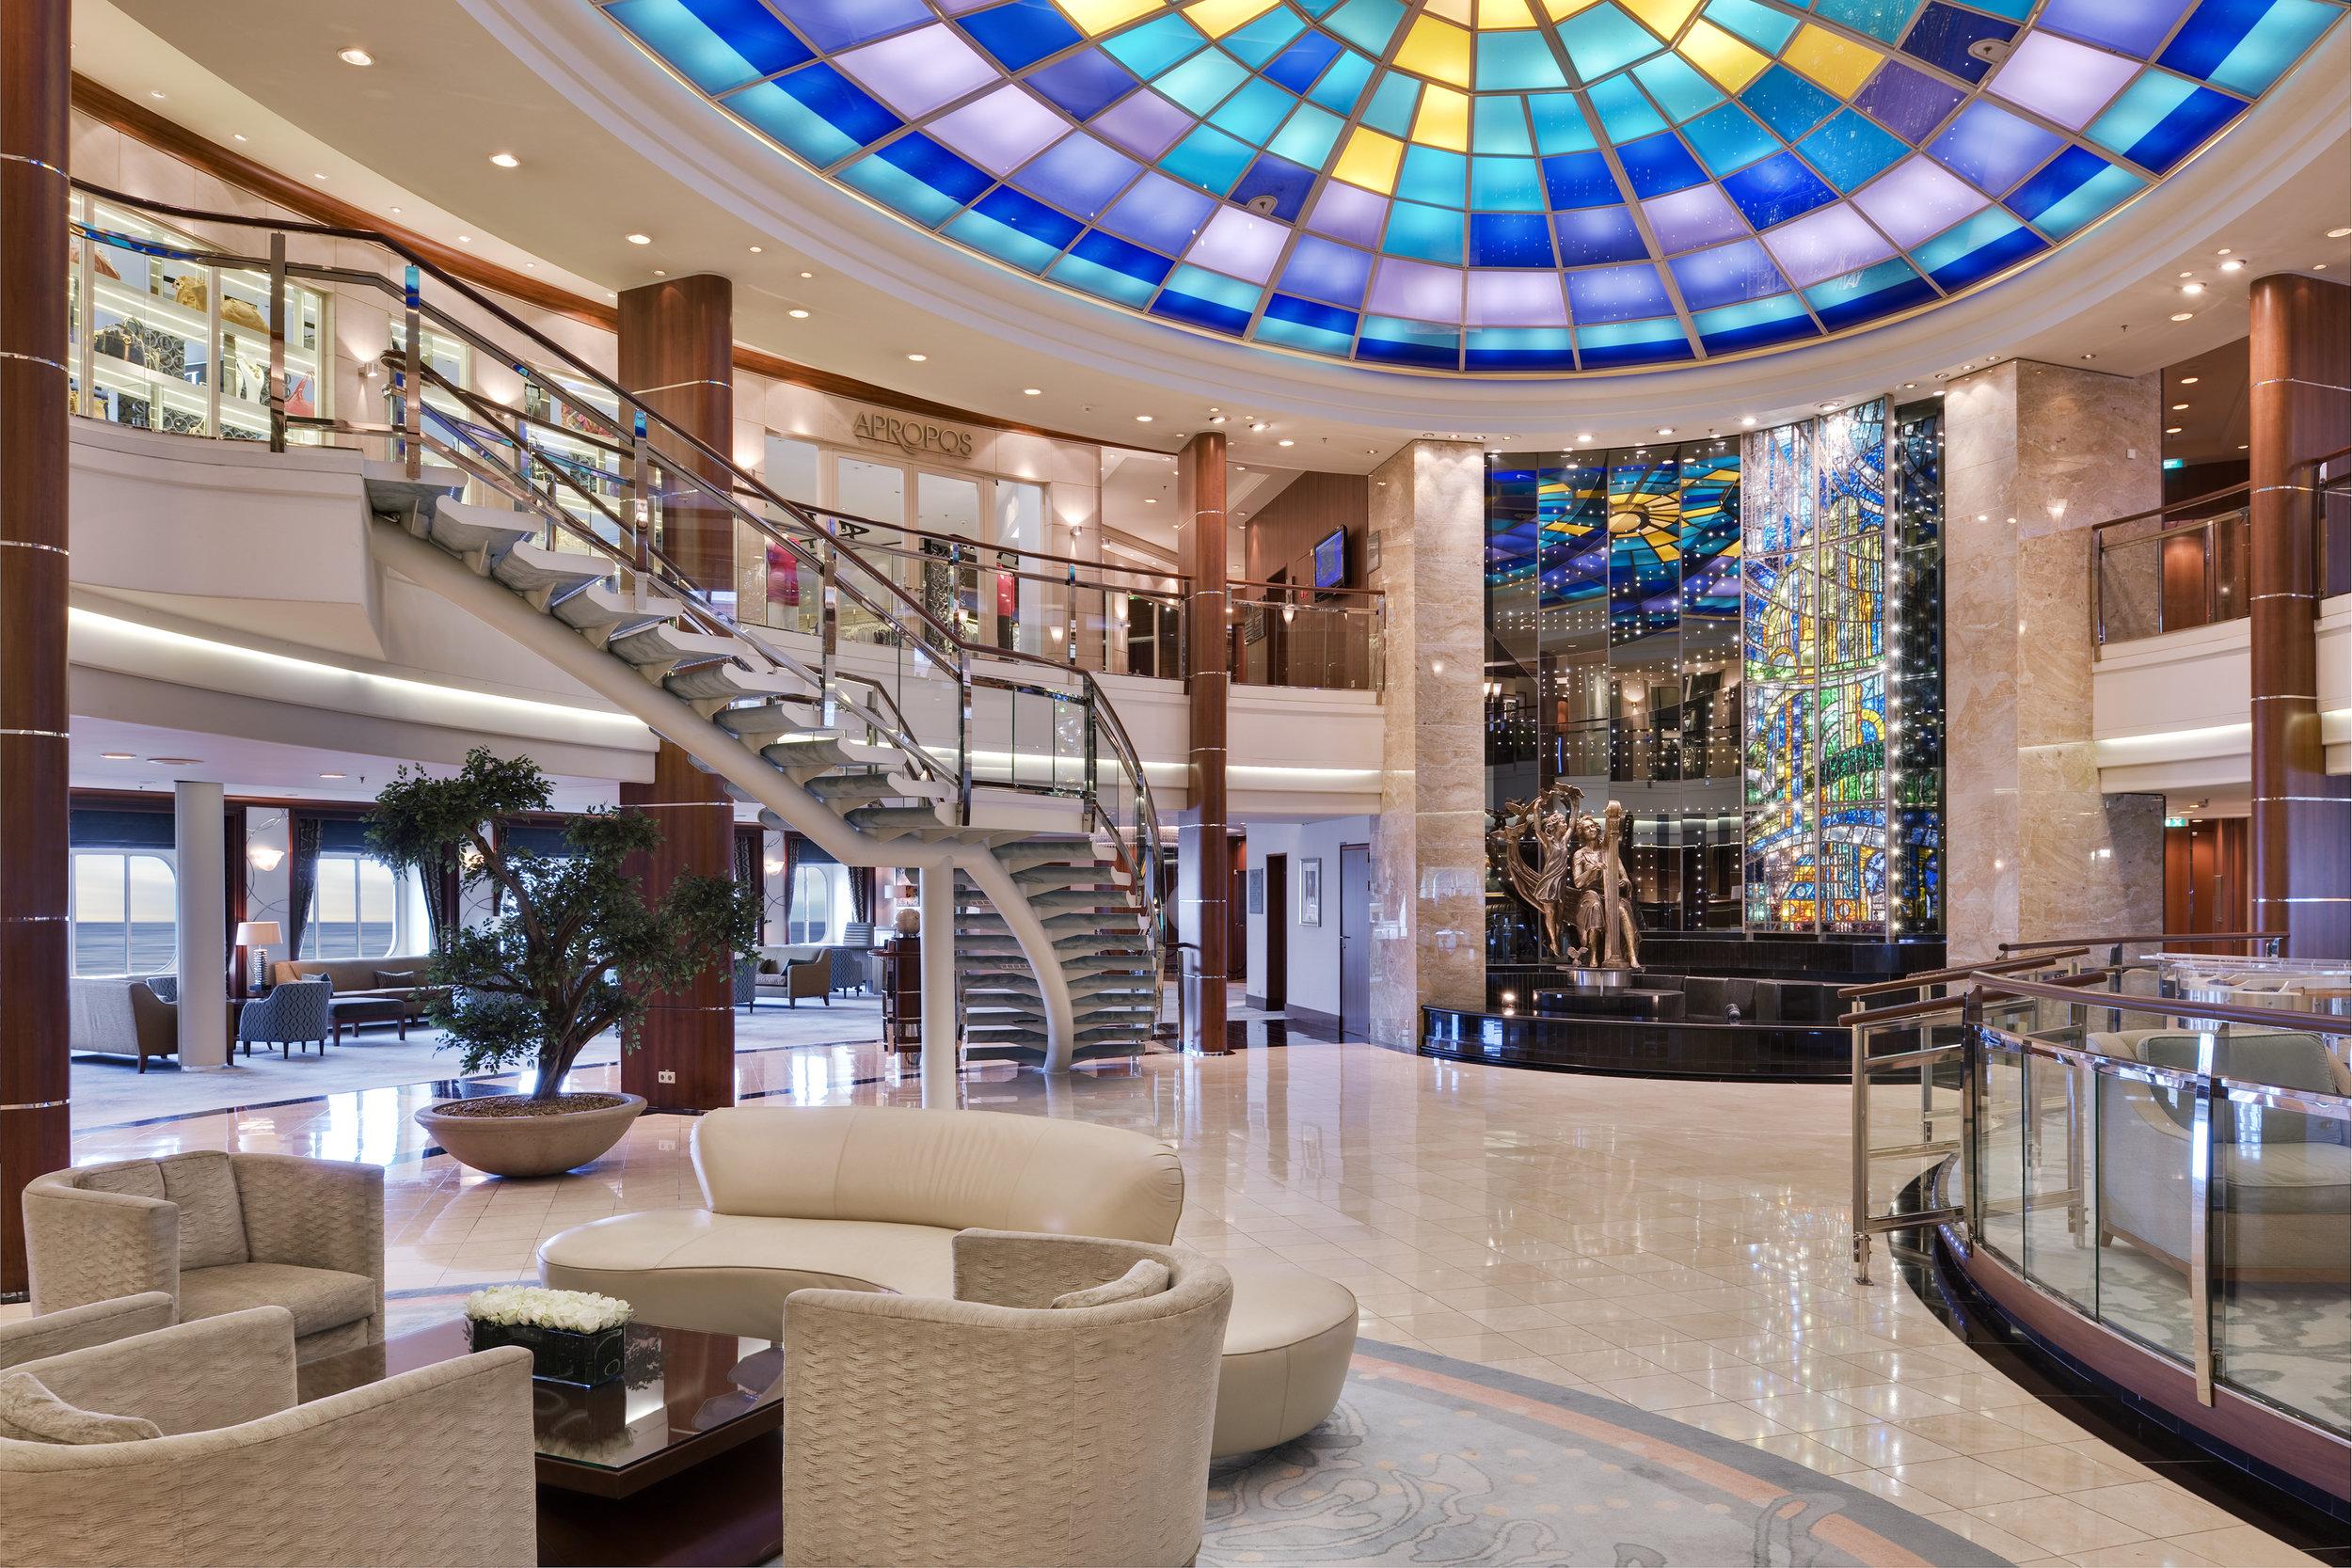 crystal serenity atrium.jpg